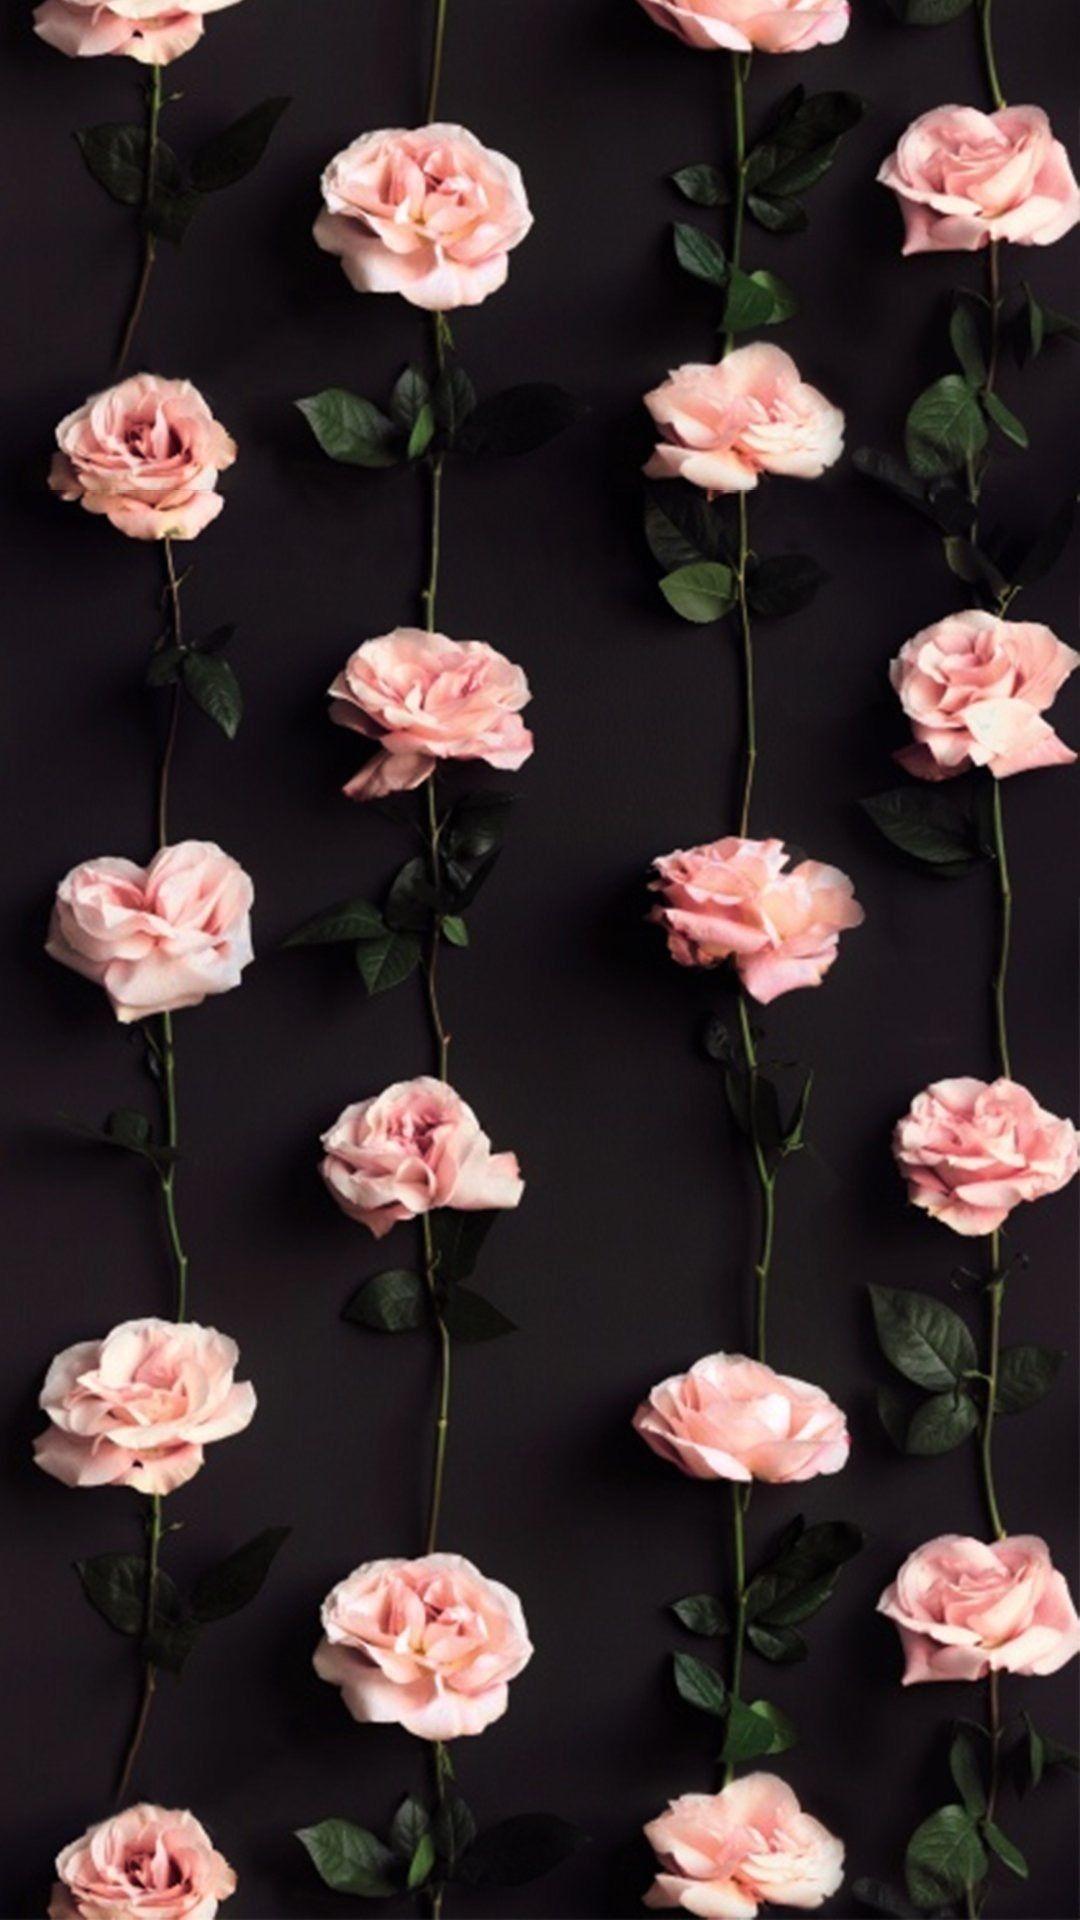 Iphone Ios 7 Wallpaper Tumblr For Ipad Flower Wallpaper